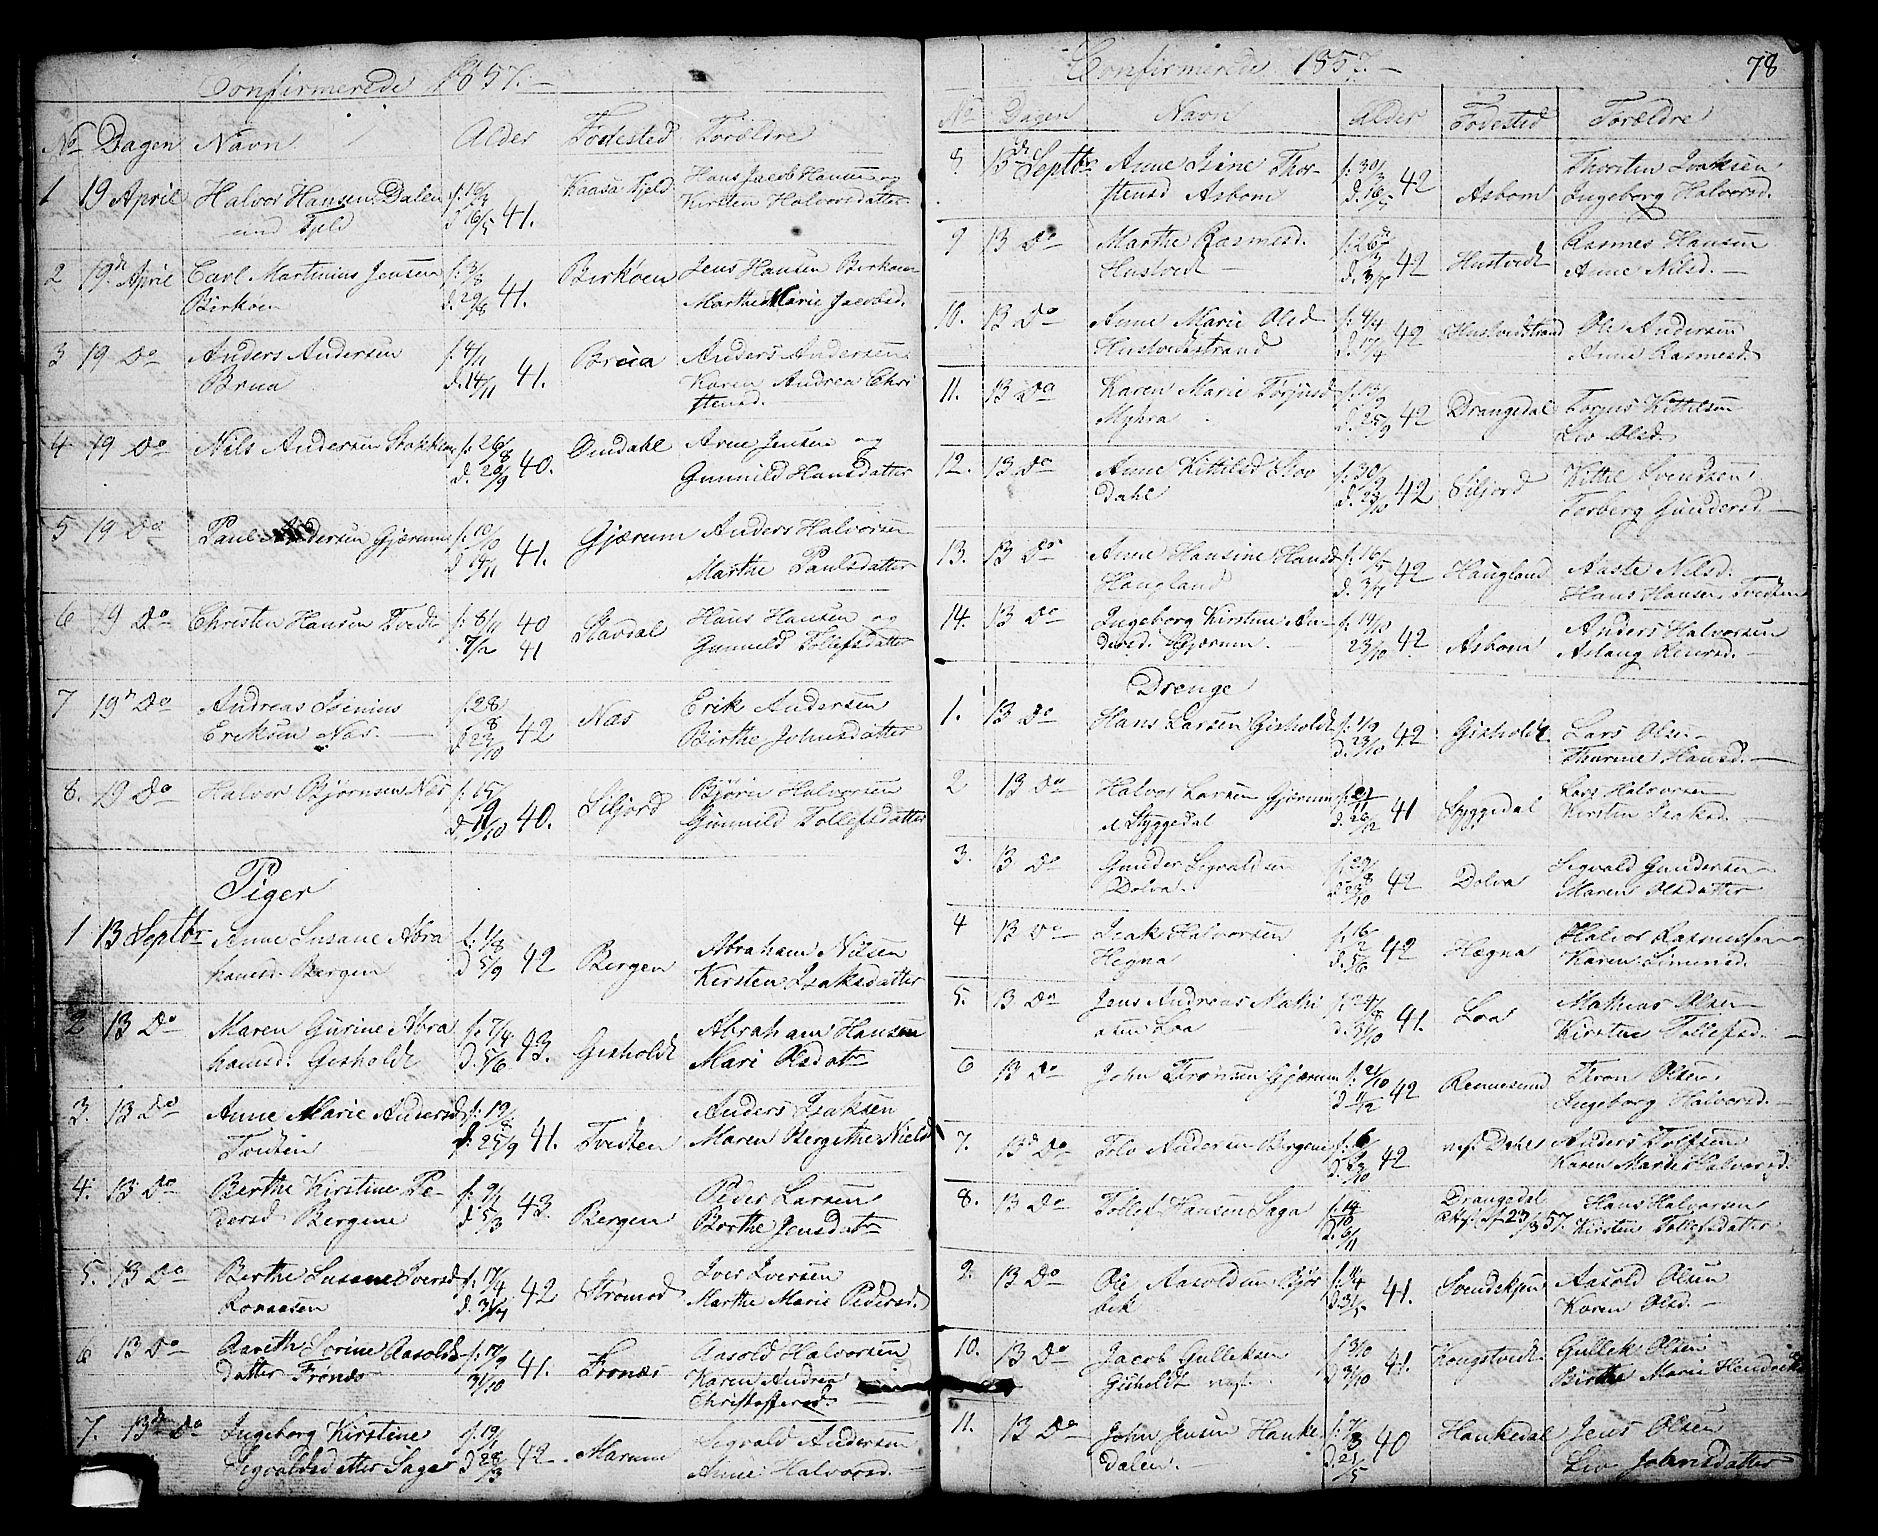 SAKO, Solum kirkebøker, G/Gb/L0001: Klokkerbok nr. II 1, 1848-1859, s. 78